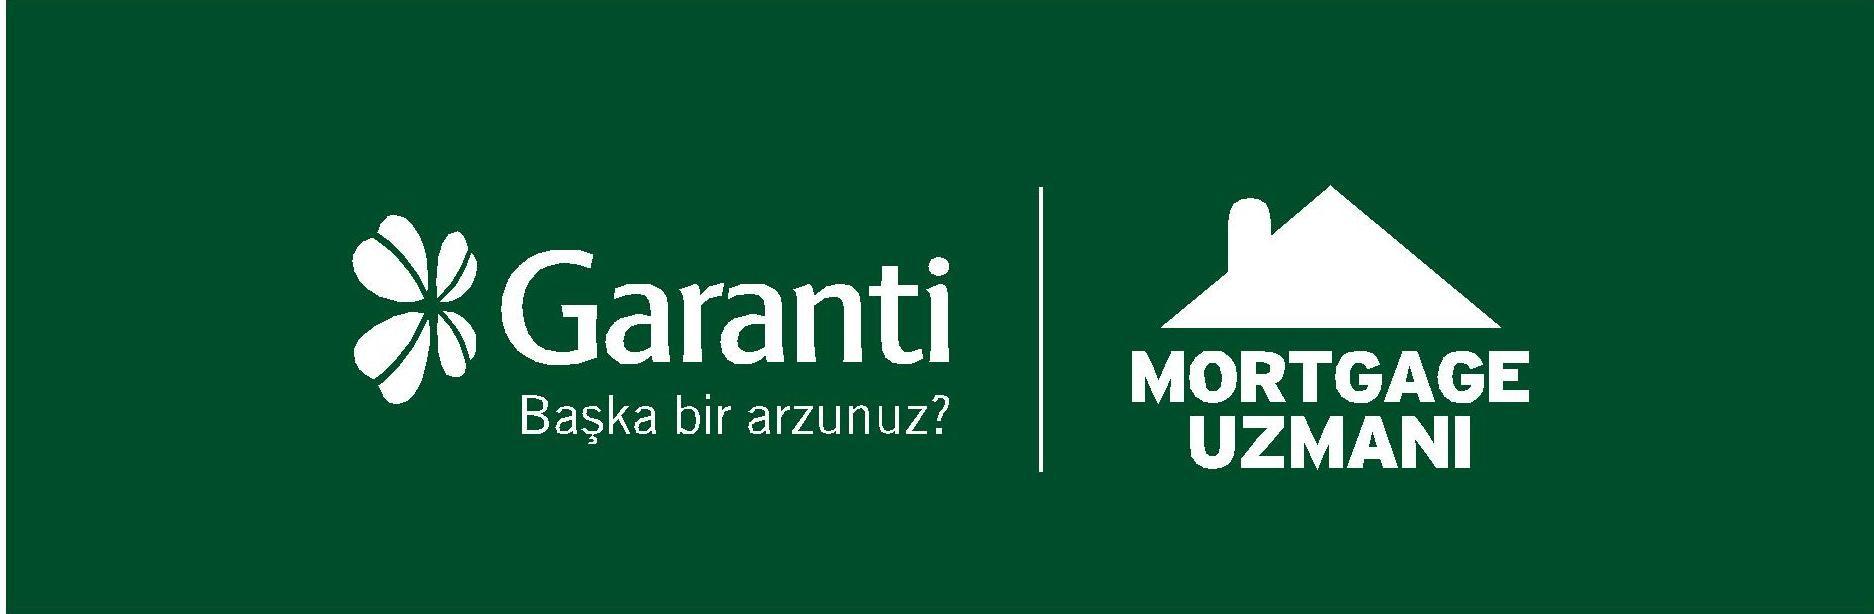 GARANTİ MORTGAGE (GARANTİ KONUT FİNANSMANI A.Ş.)